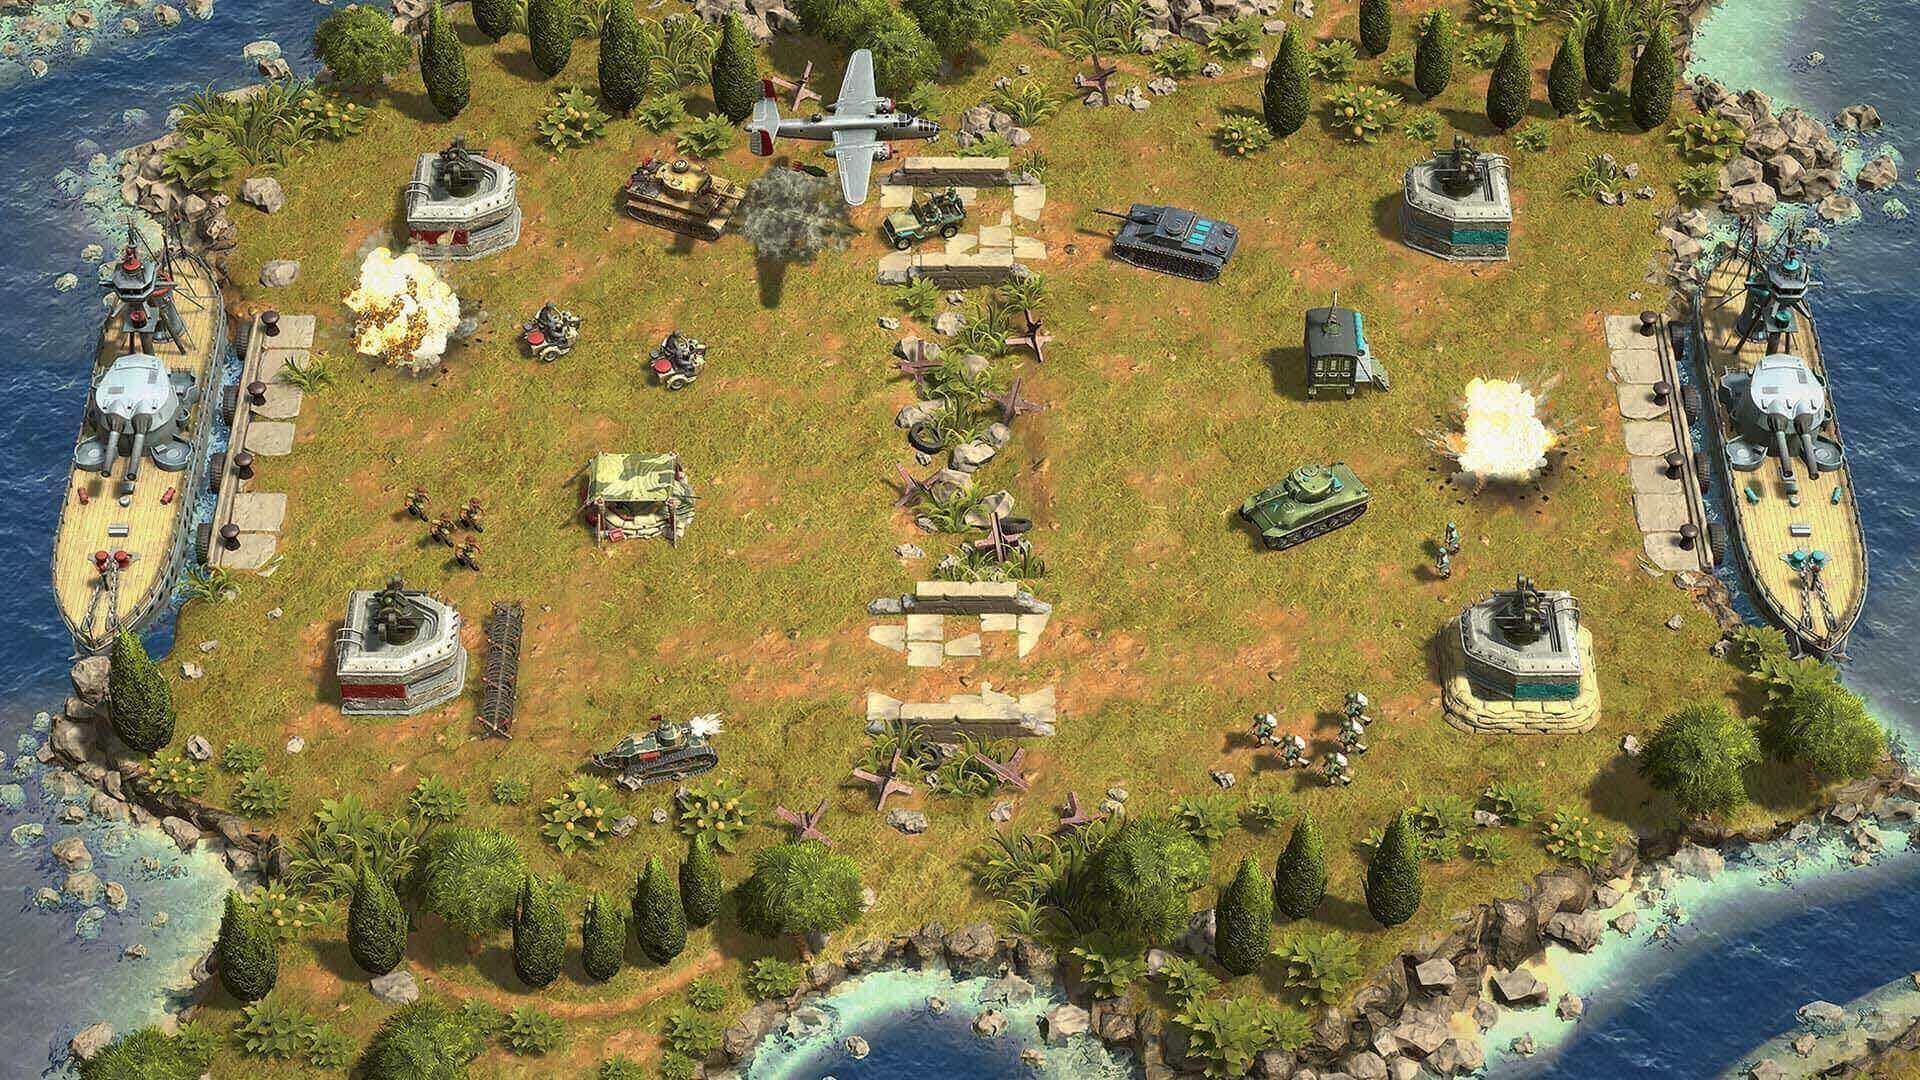 Battle Islands: Commanders